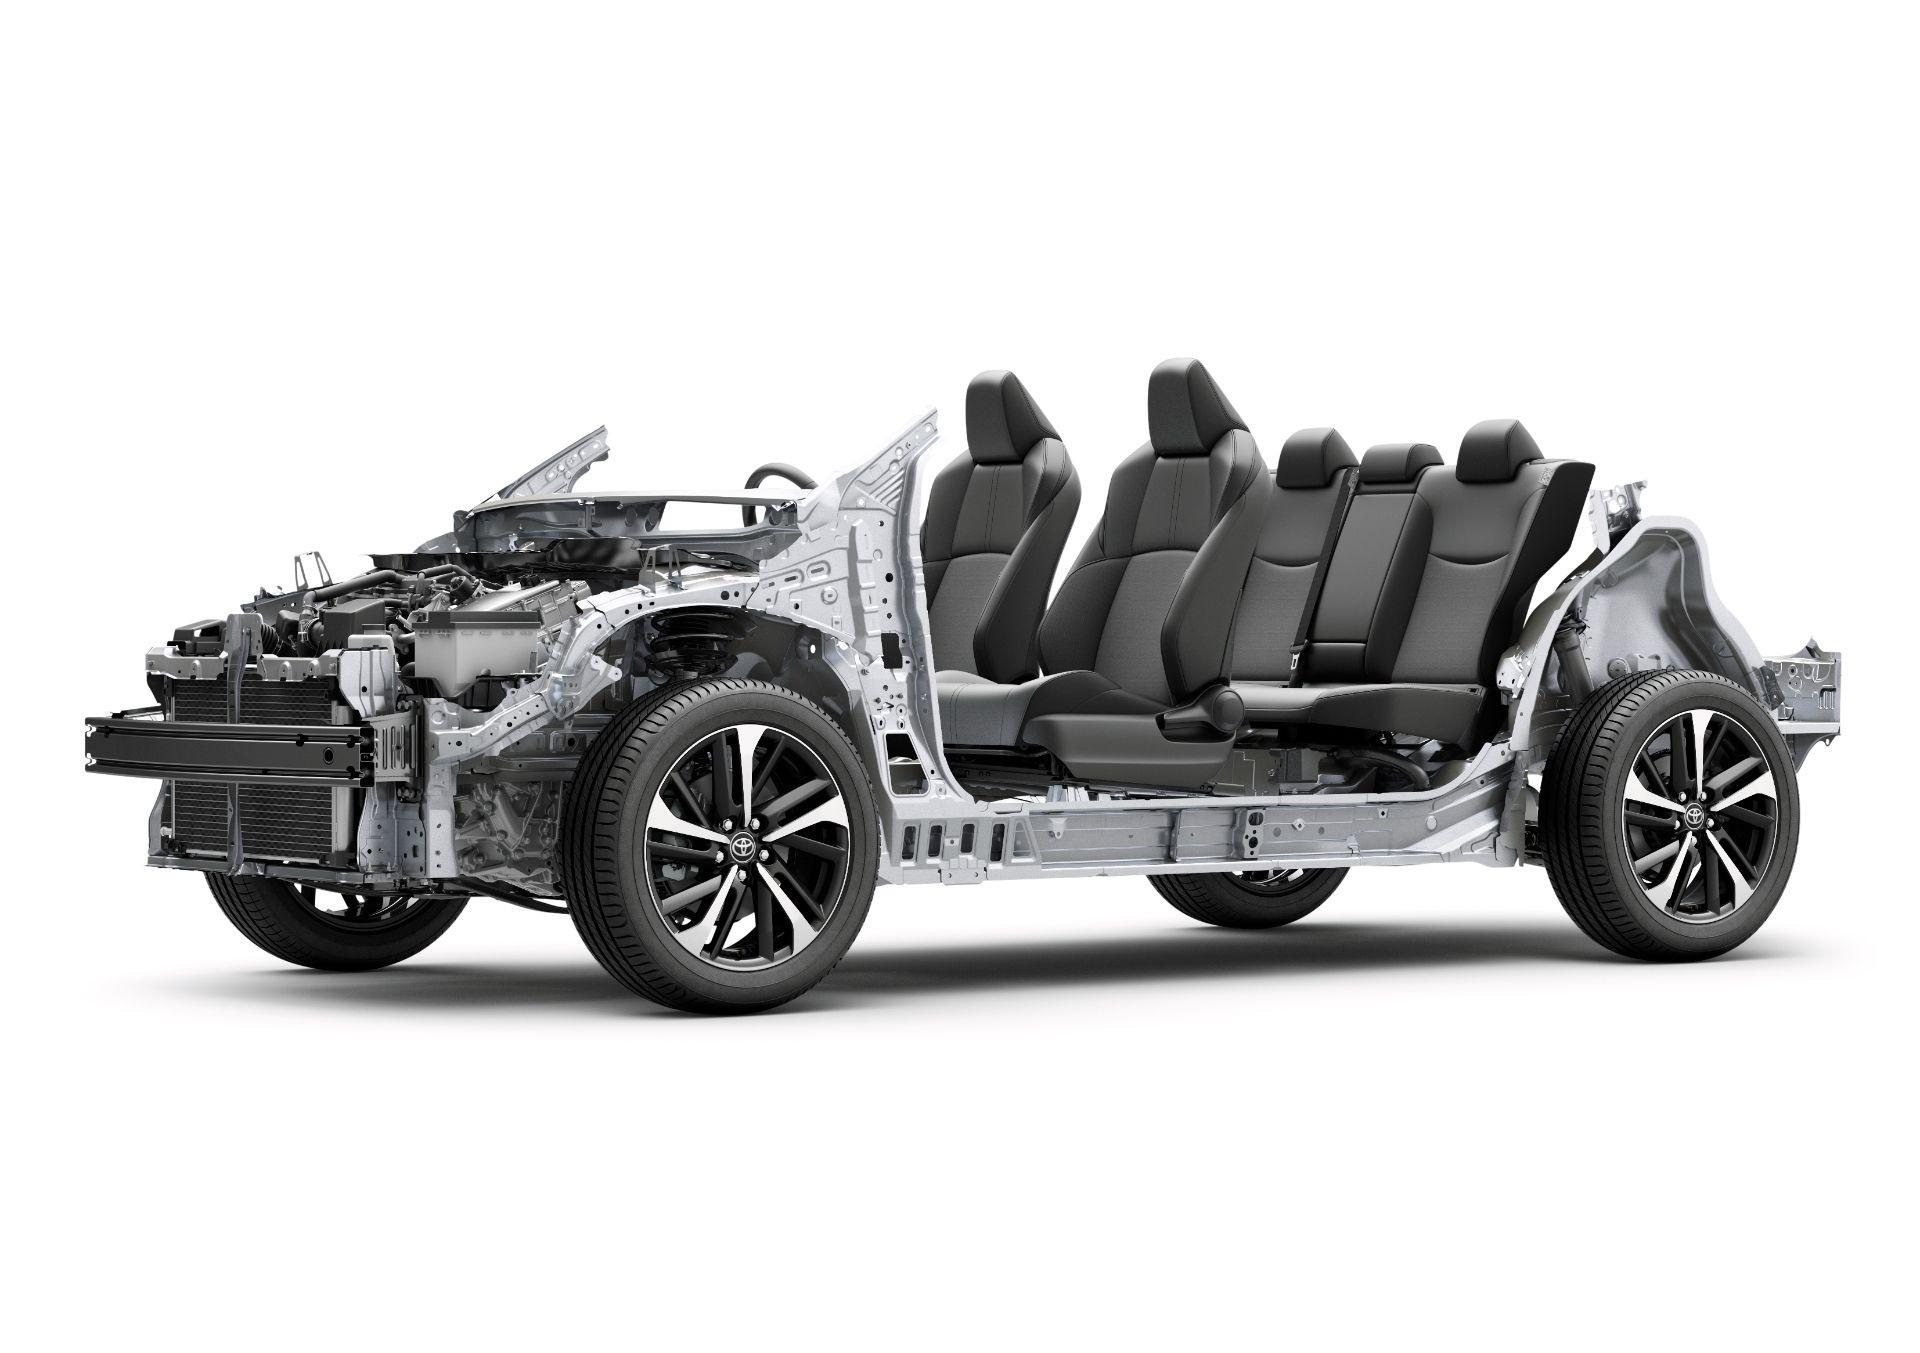 Khung gầm Toyota Corolla Cross 2022